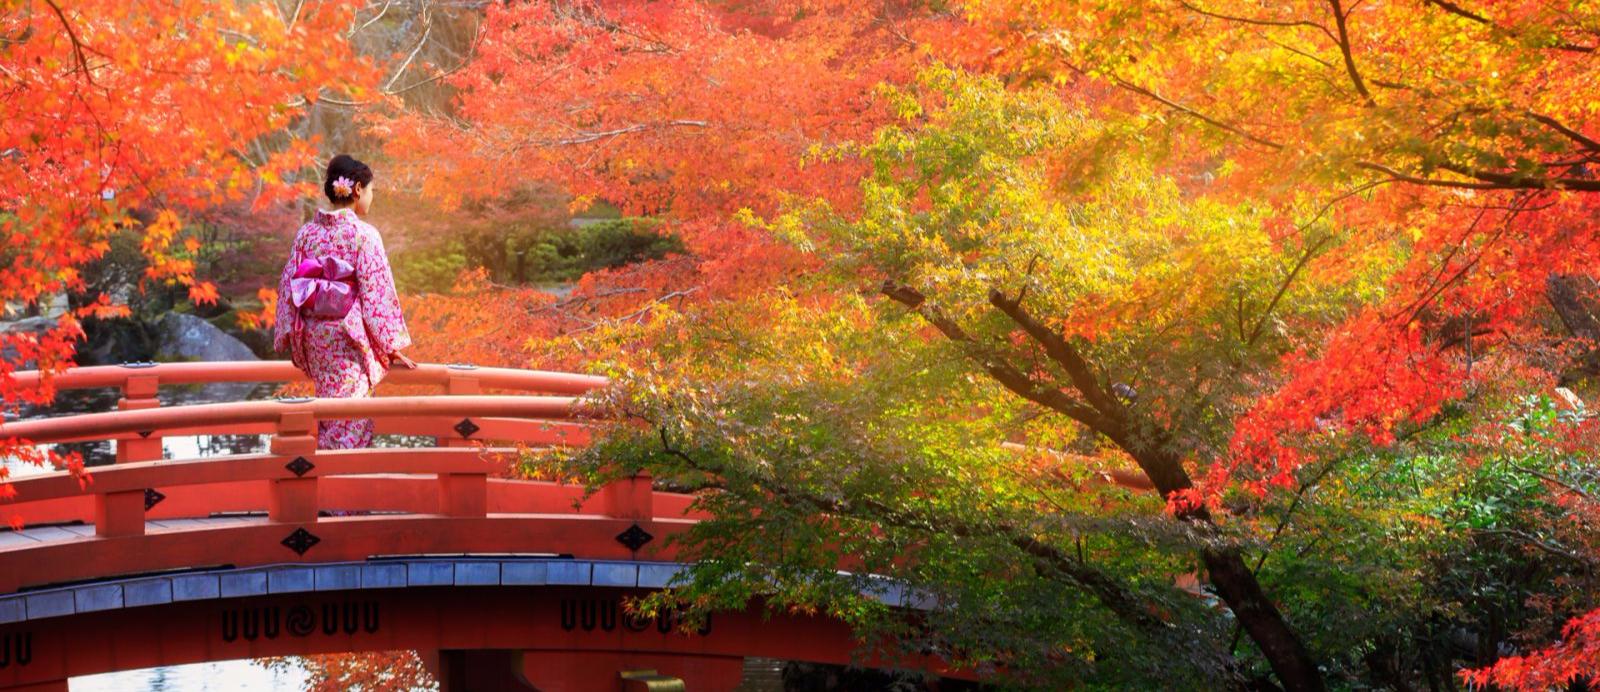 GUIA TROTAMUNDOS JAPON EPUB DOWNLOAD